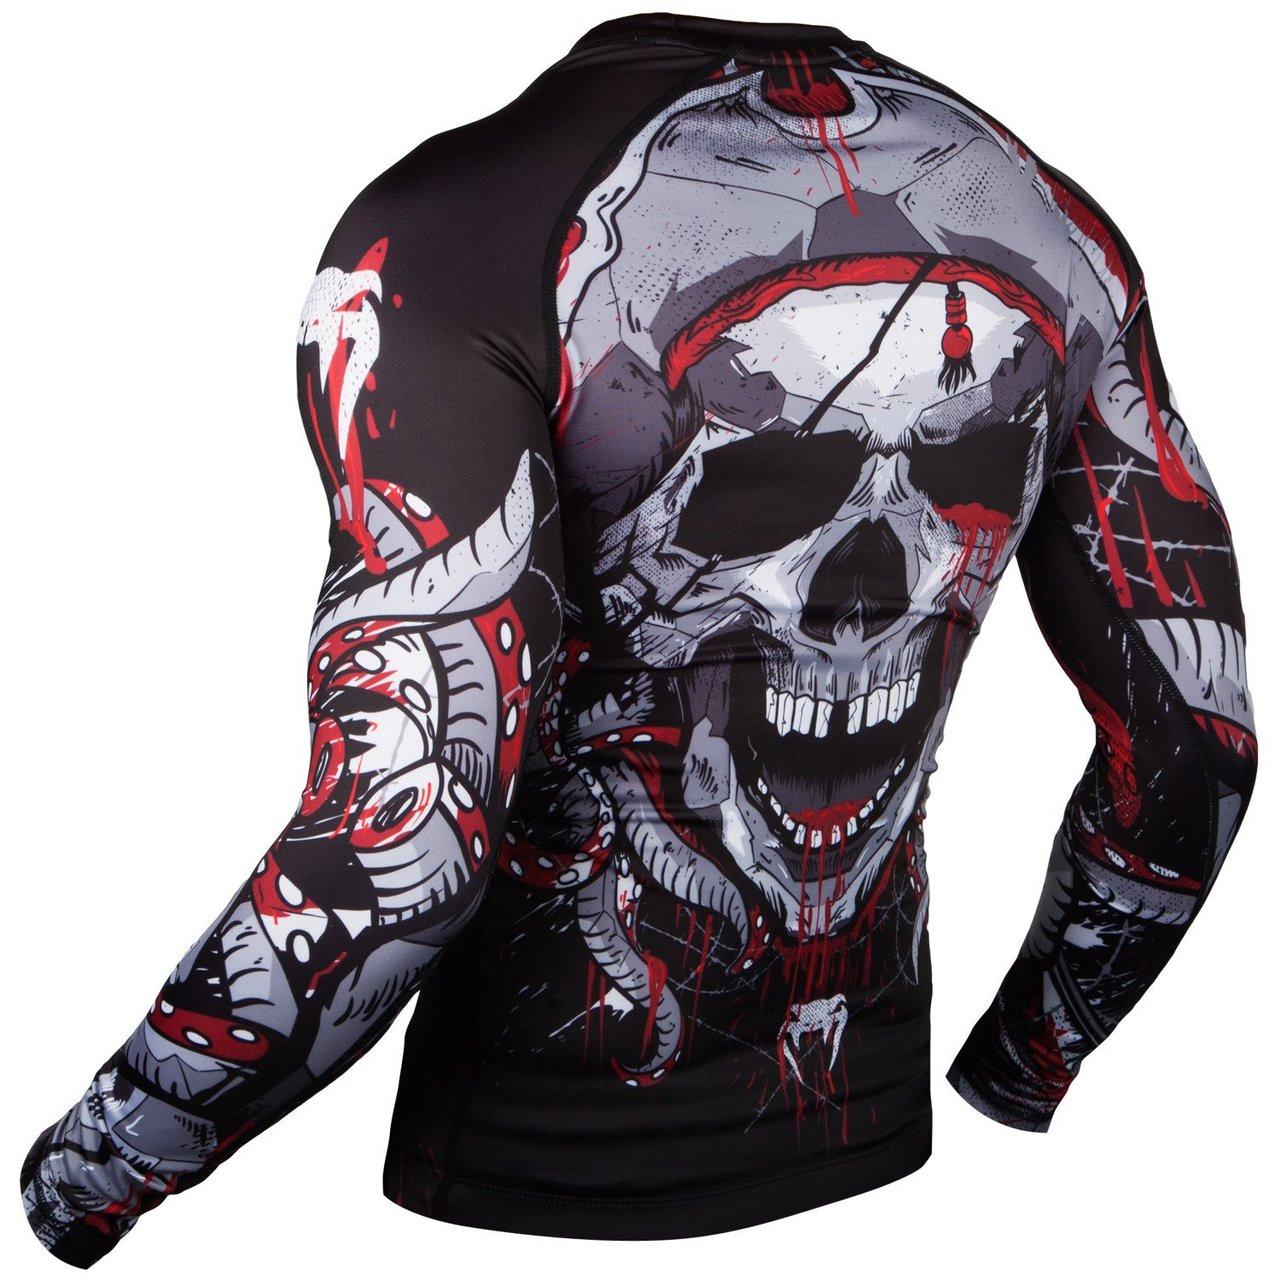 Venum Pirate 3 0 Rashguard MMA/BJJ (Black/Red) Longsleeve